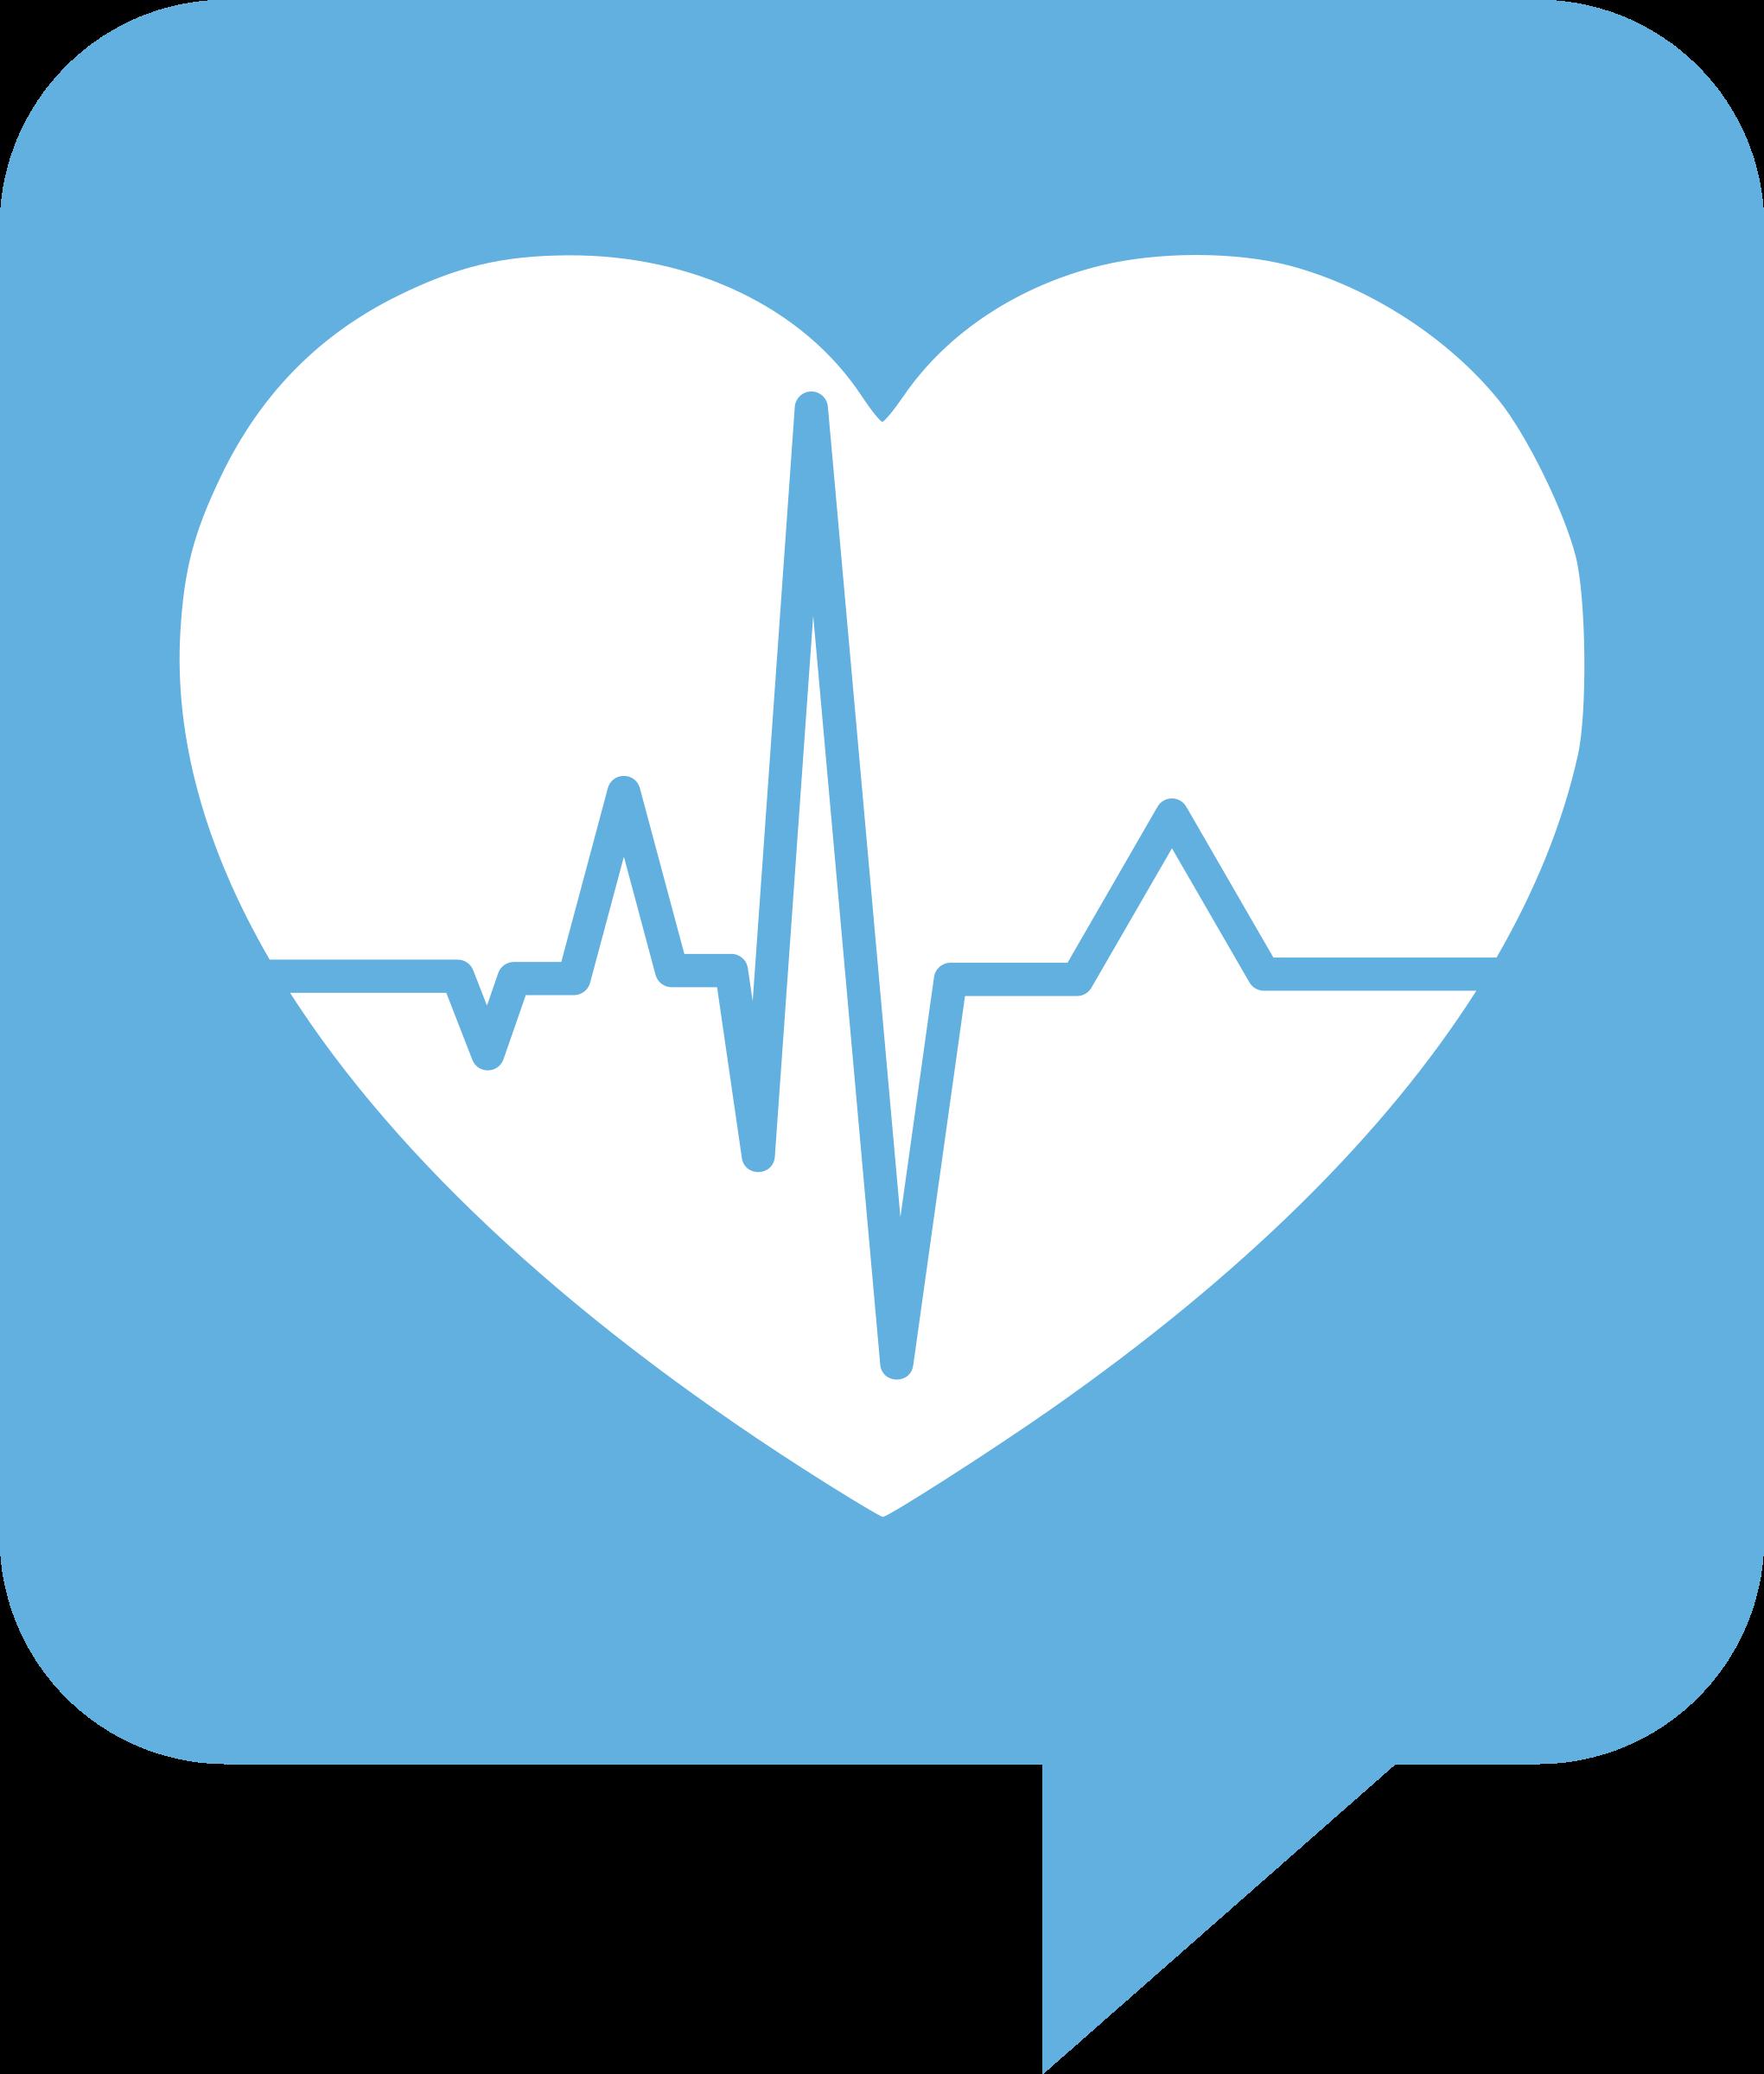 Heartbeat clipart bradycardia. Laudable group veterans reporter